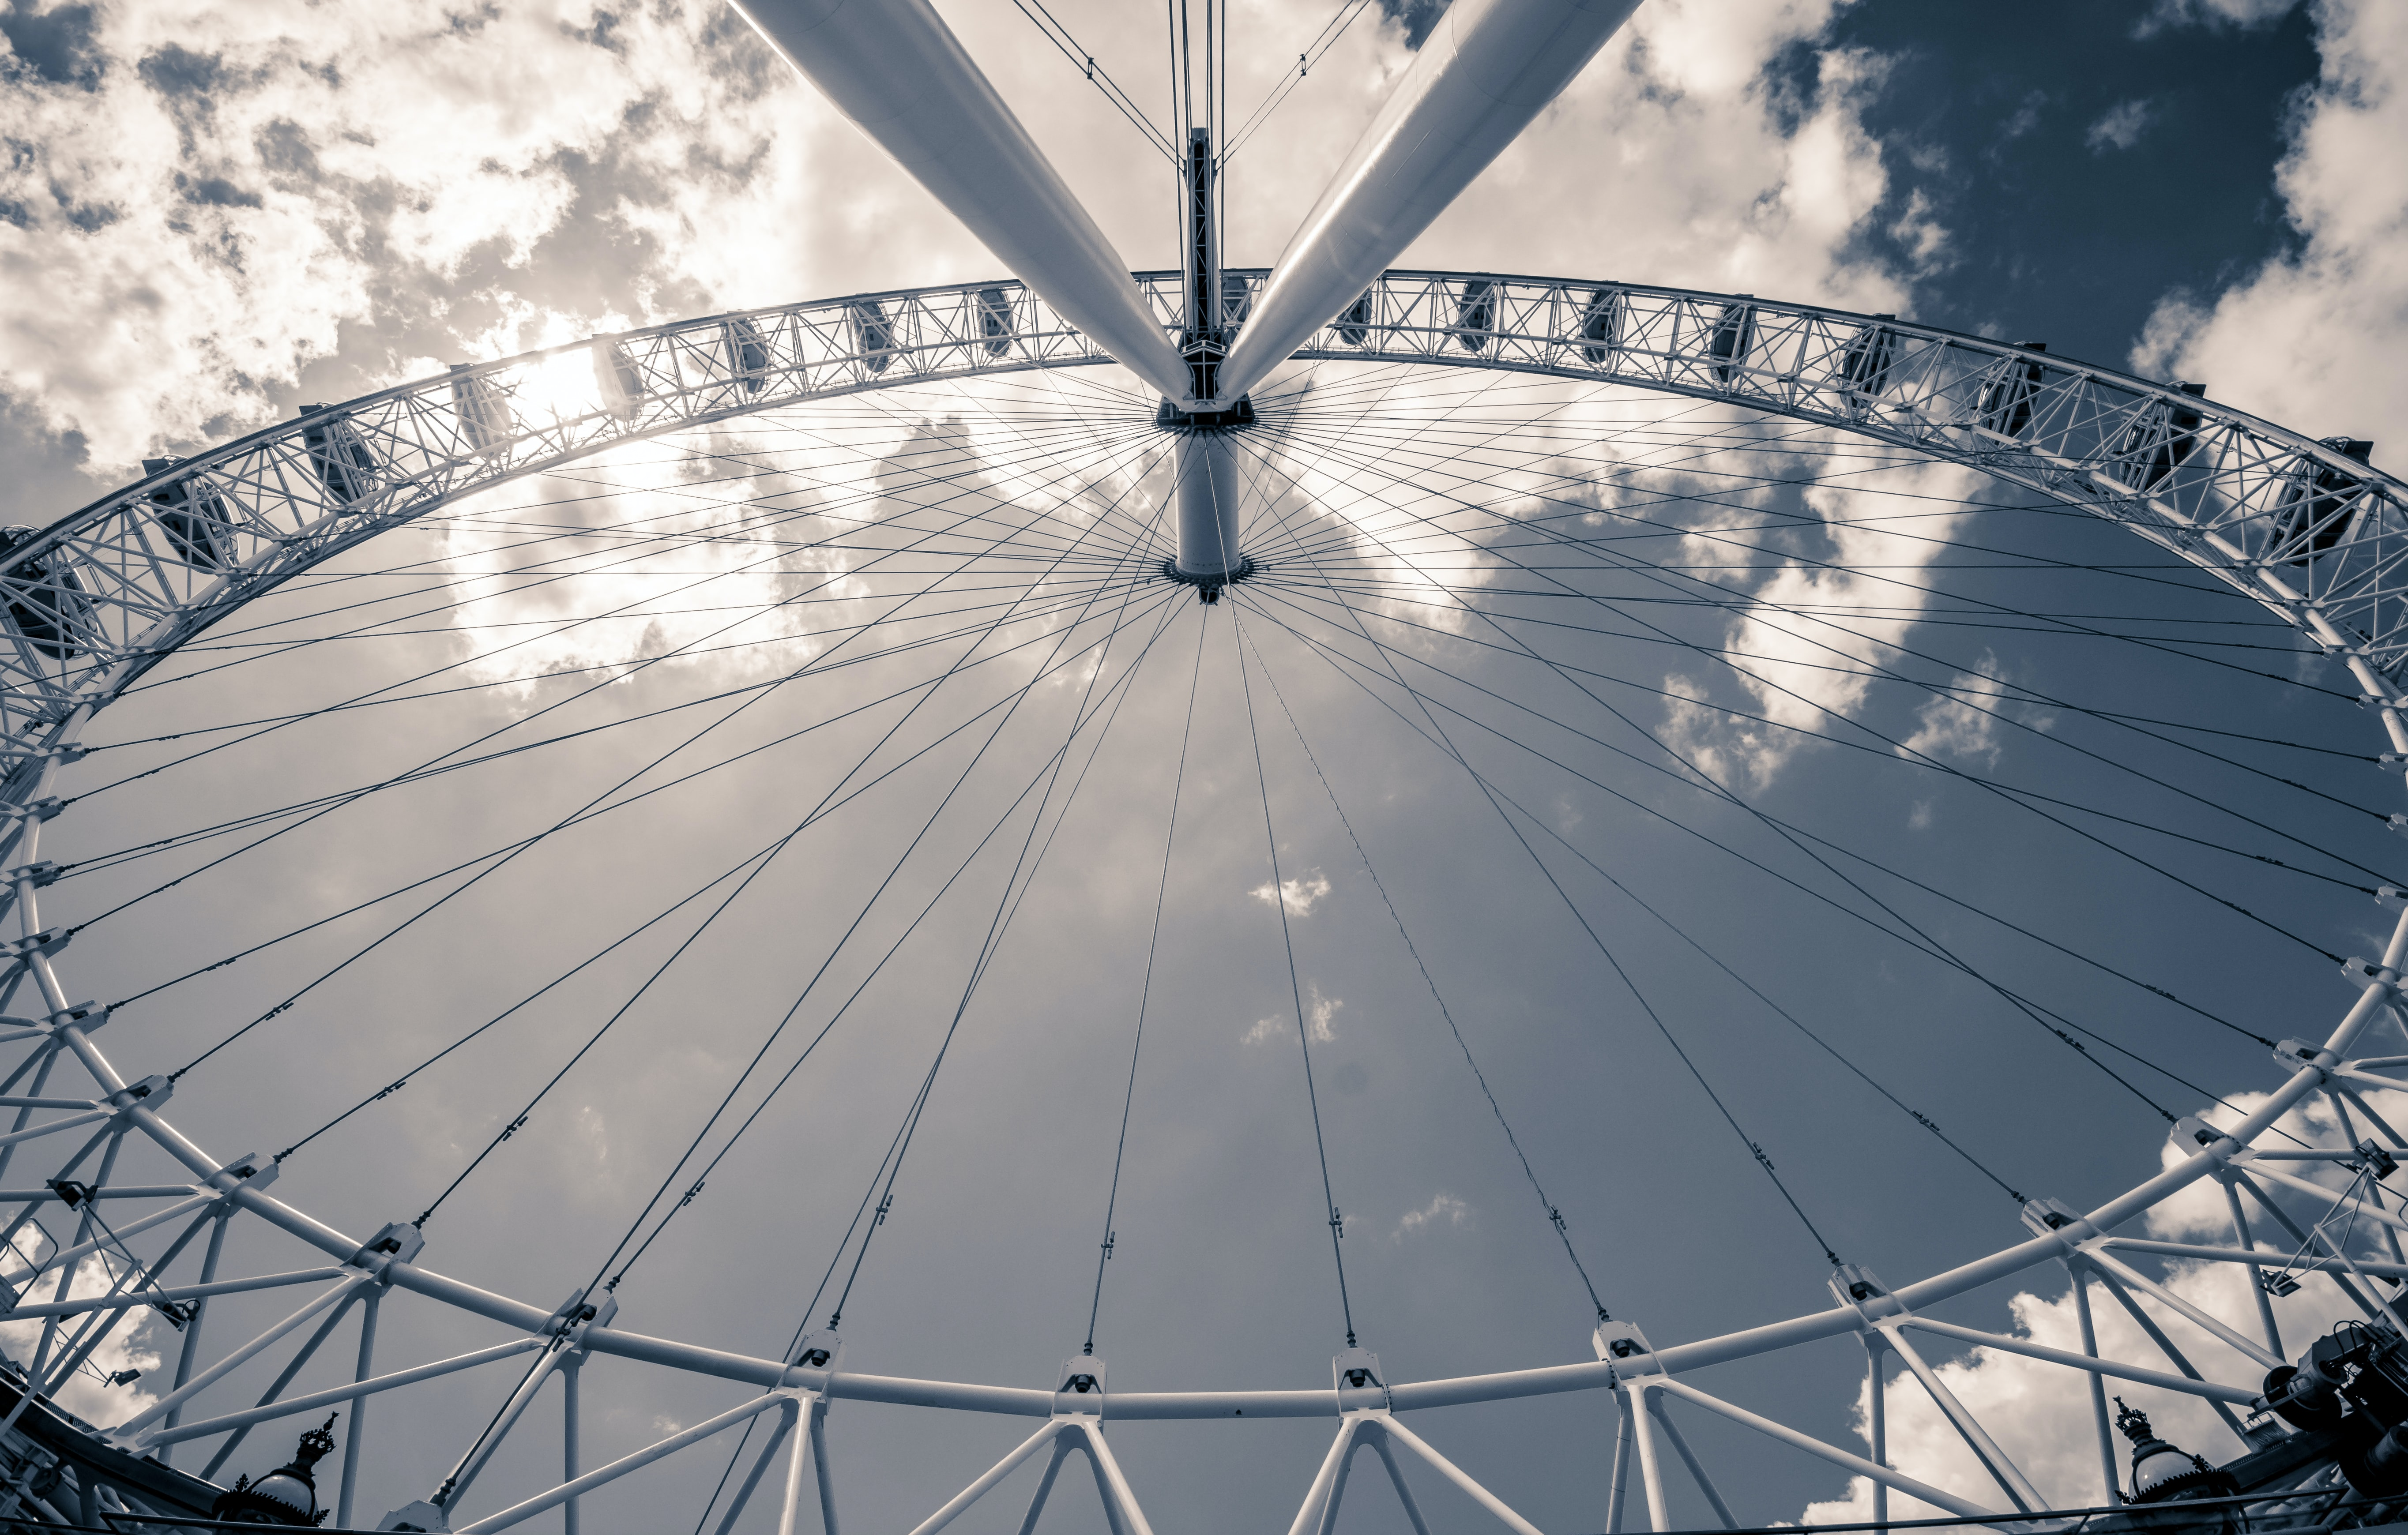 low angle photo of white metal ferris wheel during daytime